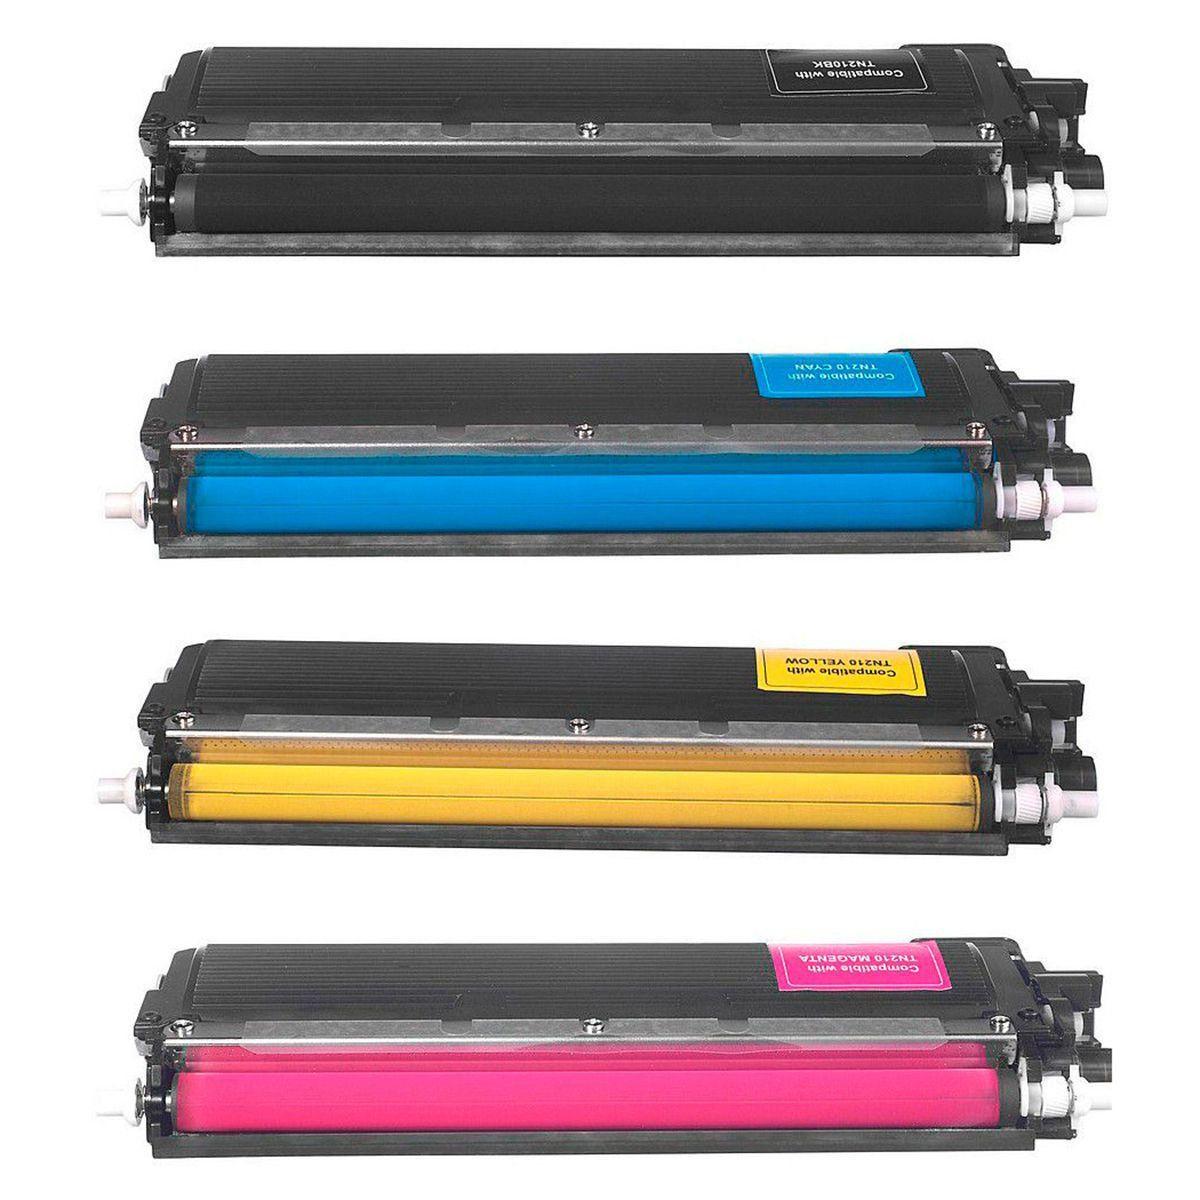 Compatível: Kit Colorido de Toner TN210 para Brother HL-3040cn HL-3070cn HL-3045cn MFC-9120cn 9320cw 9010cn 8370cn